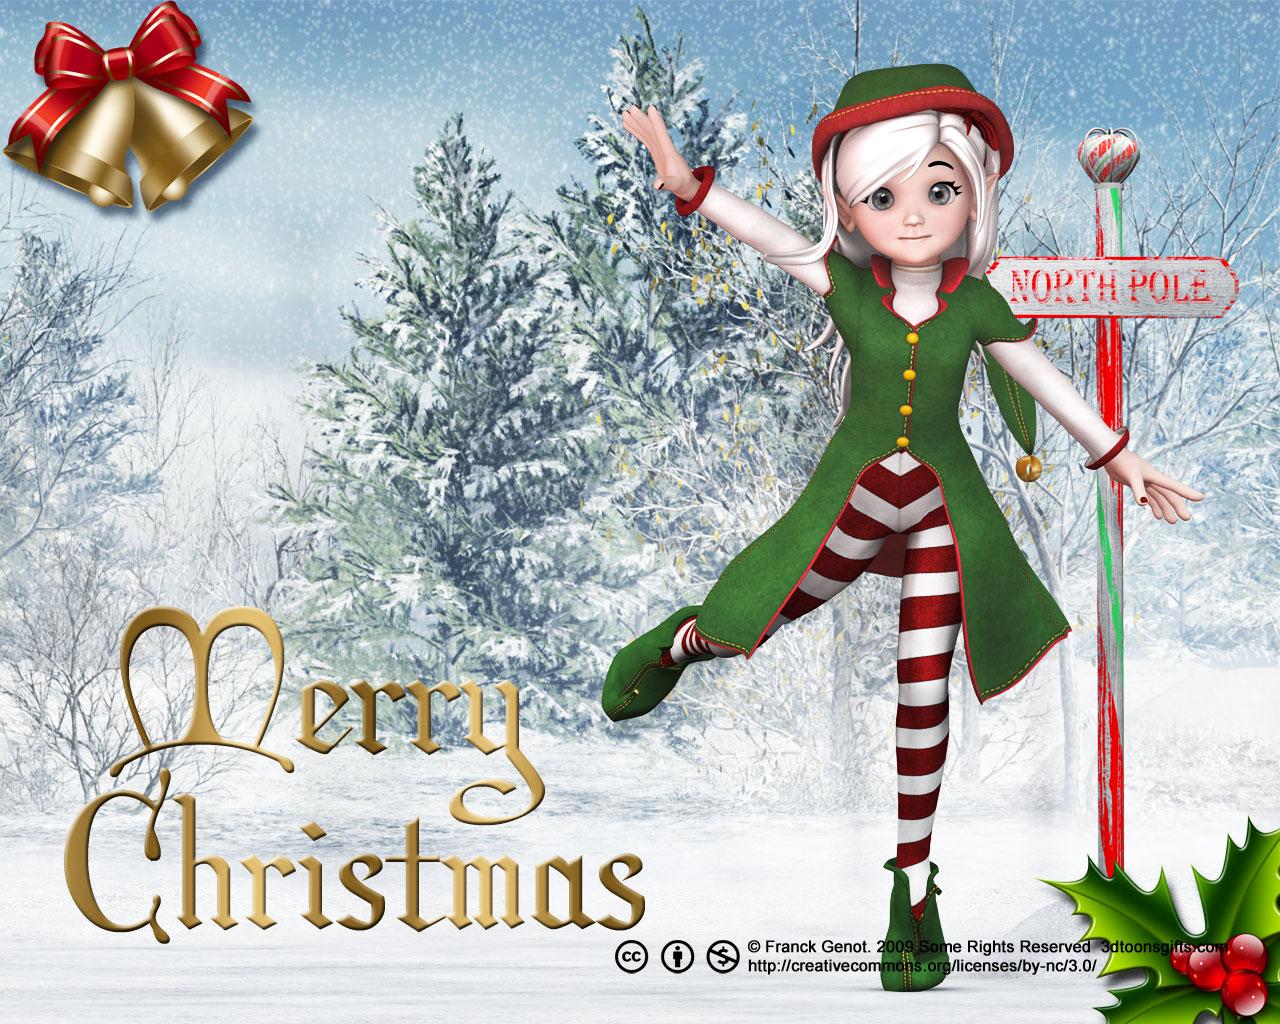 christmas elf wallpaper 4 533x400 1280x1024